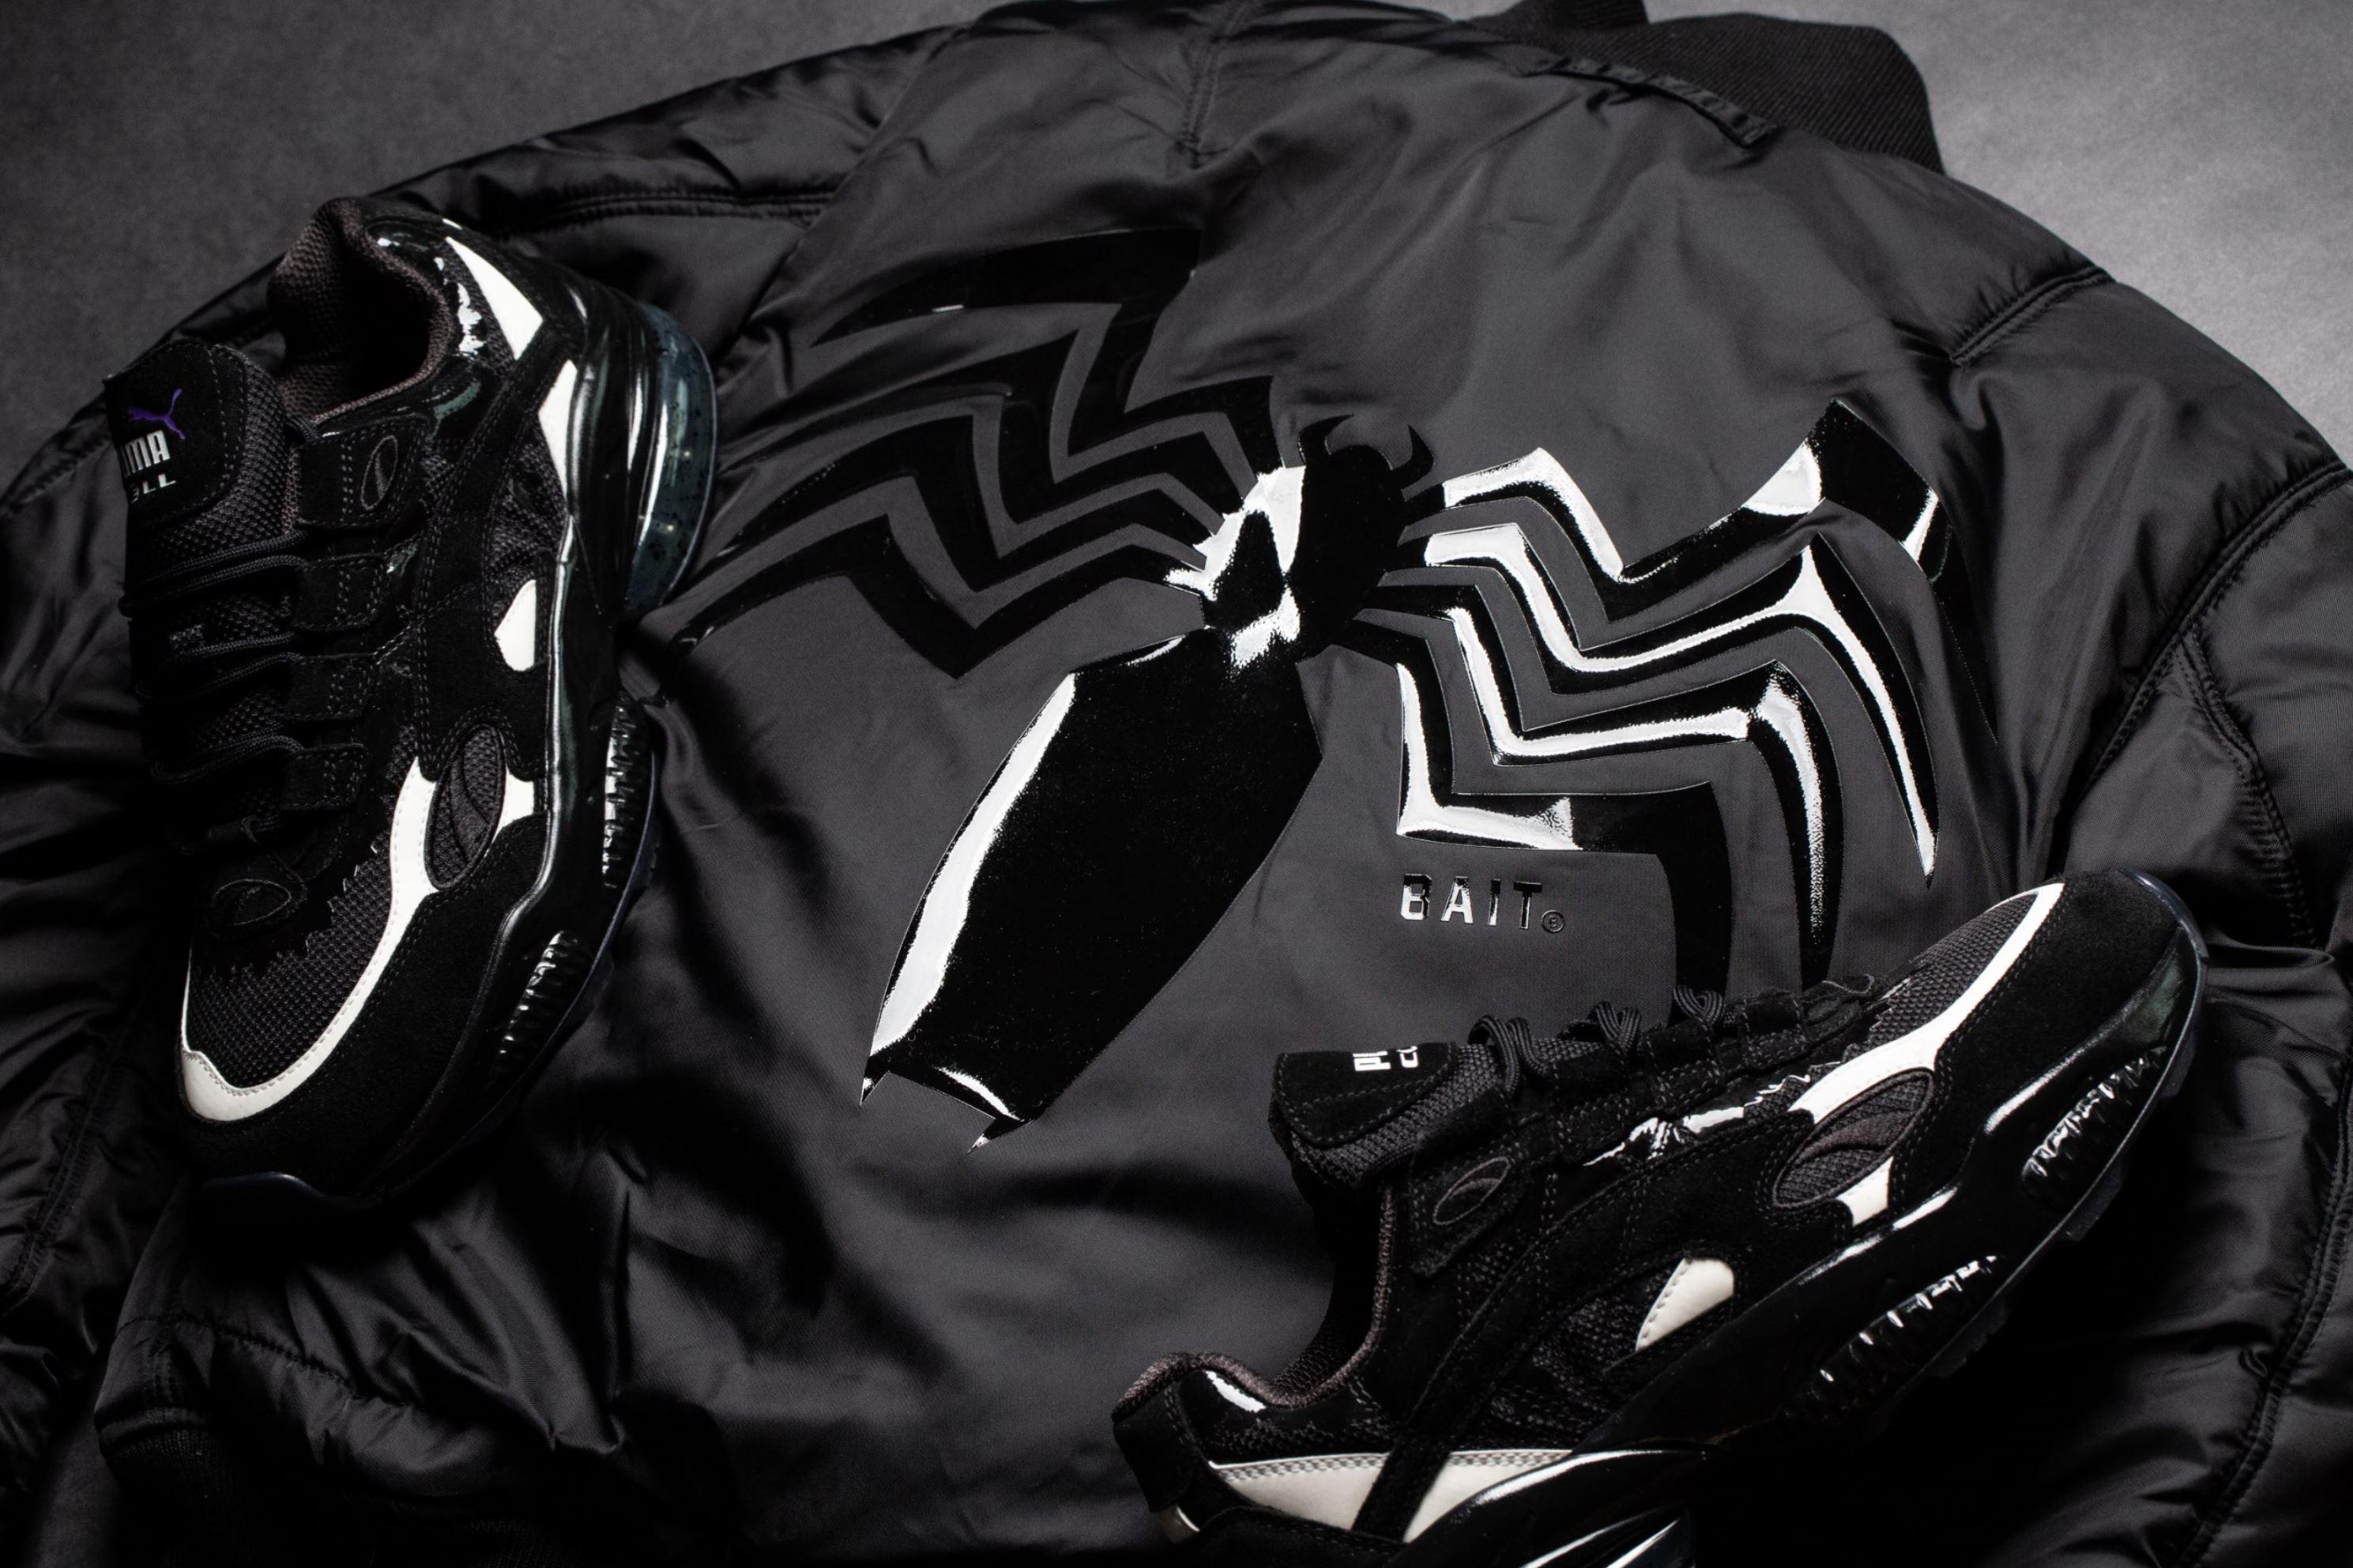 bait x marvel venom x alpha industries MA-1 jacket